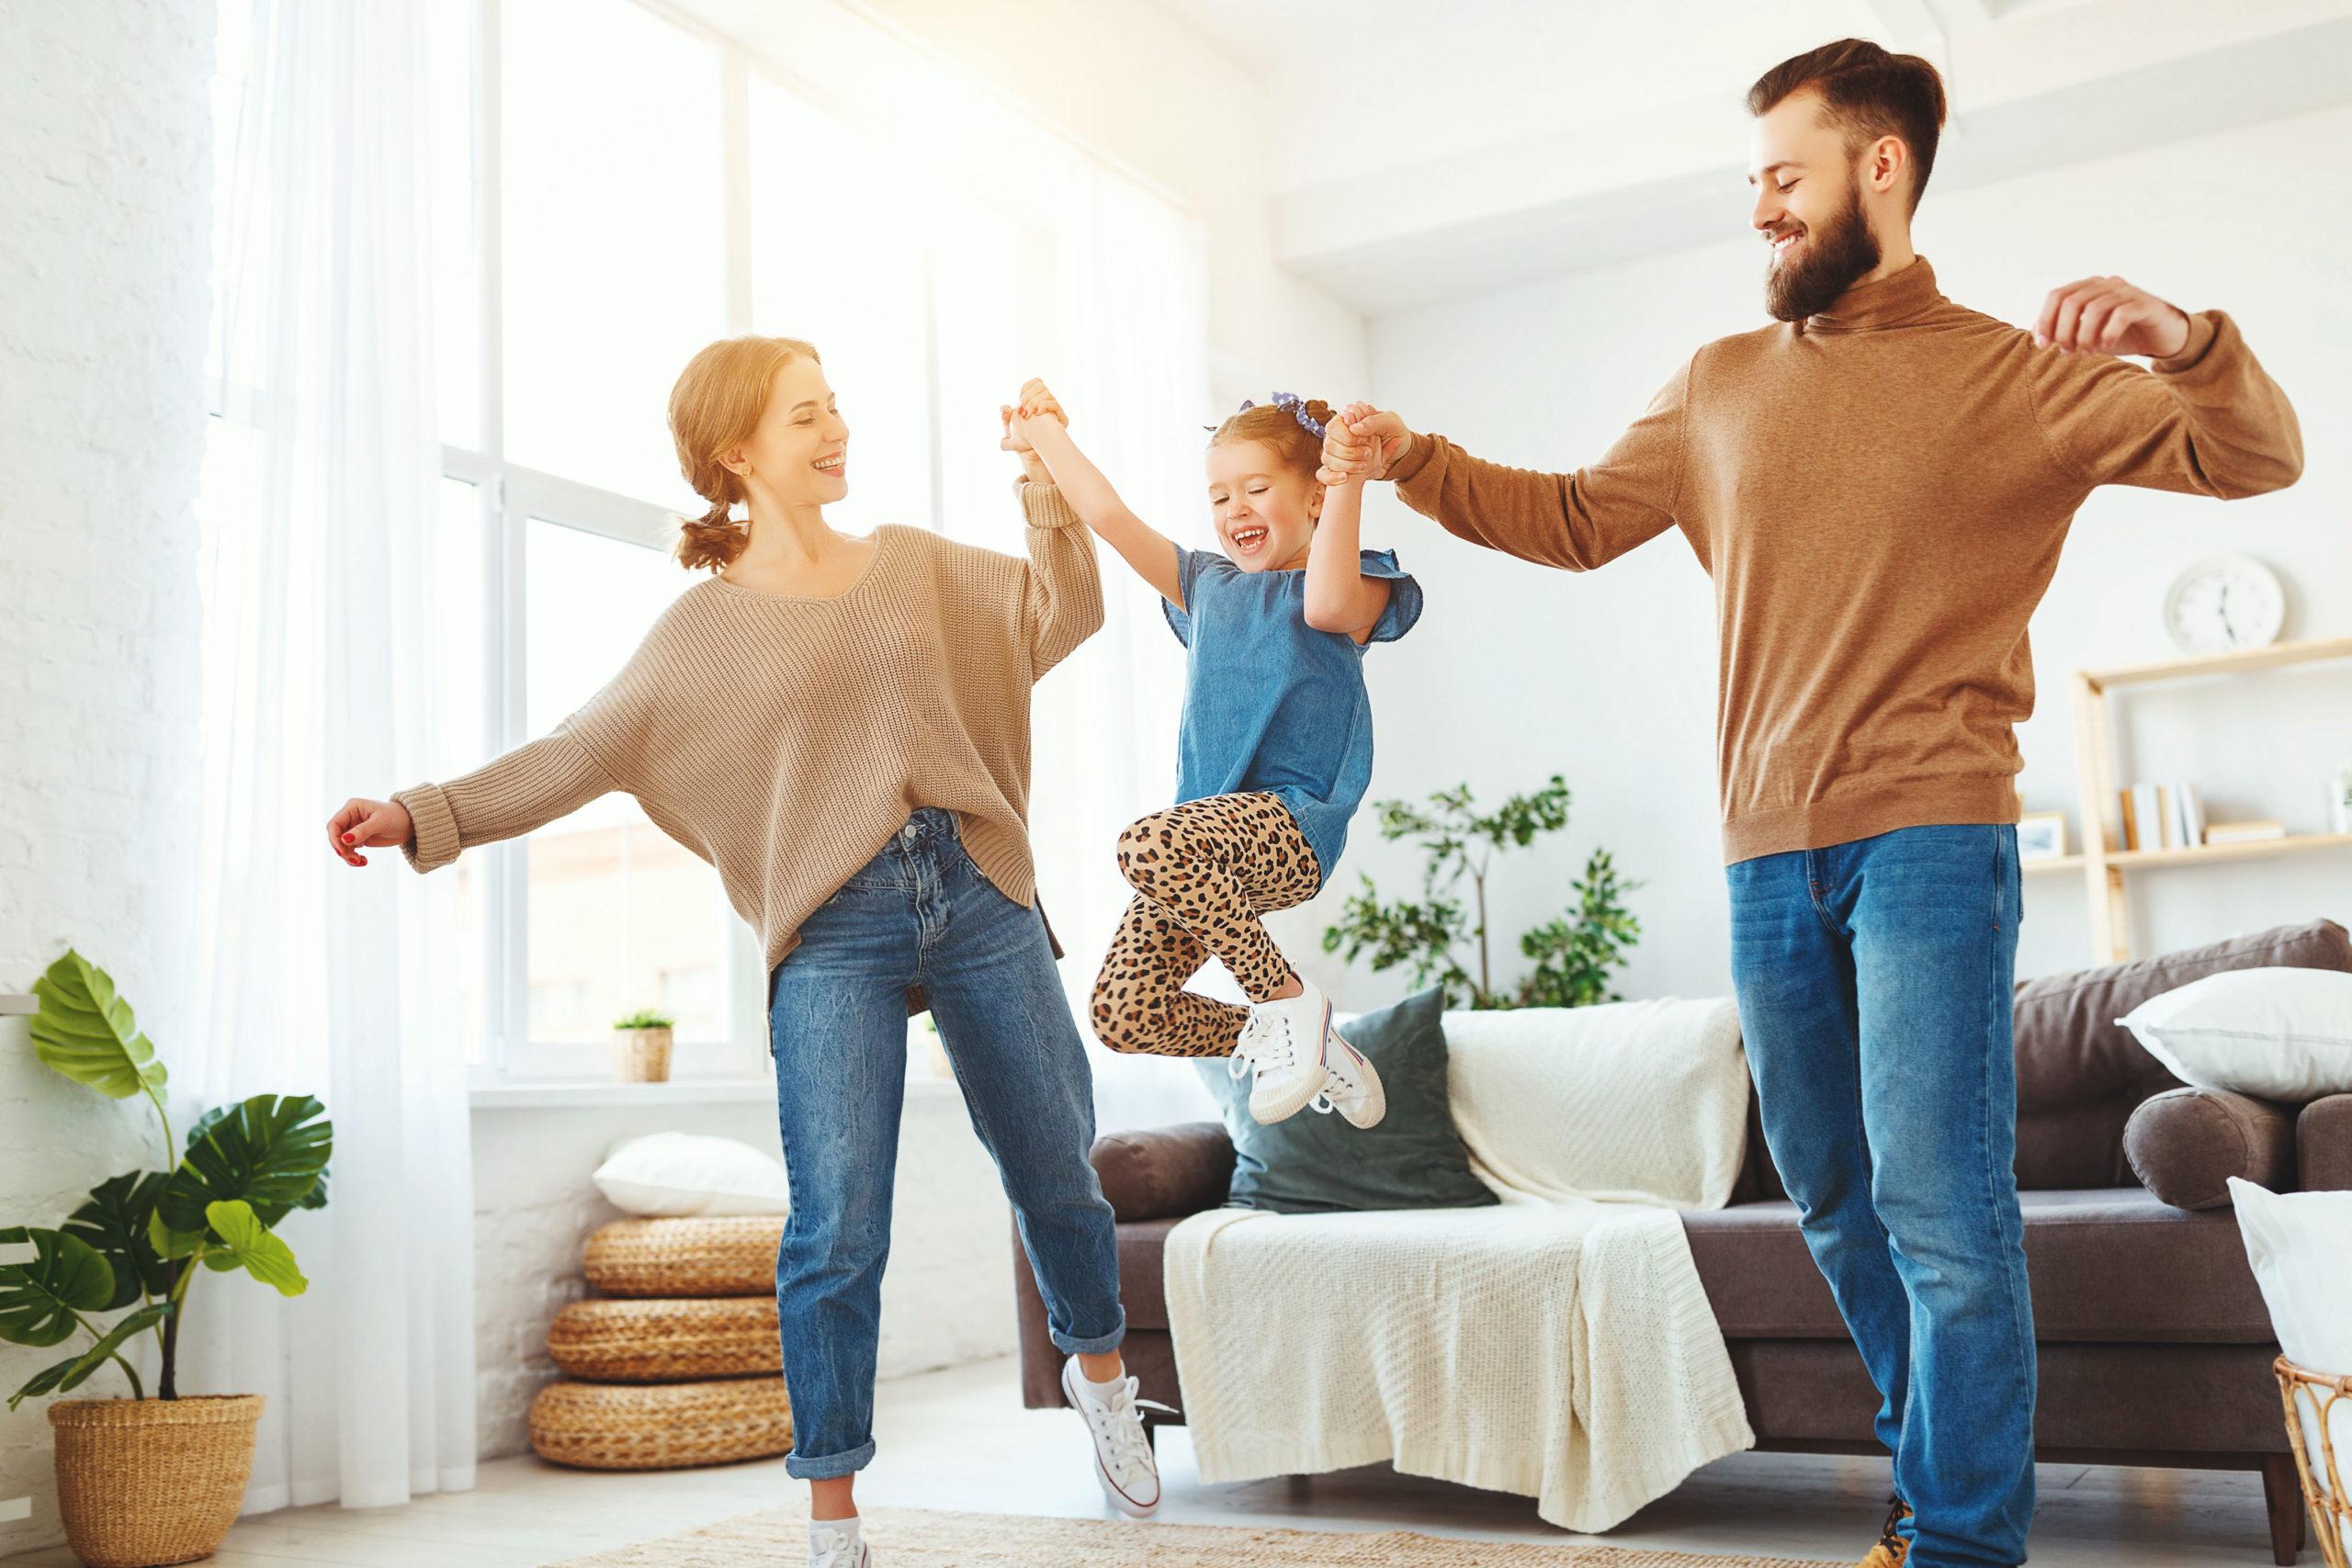 Happy Family dank Wohnraumlüftung